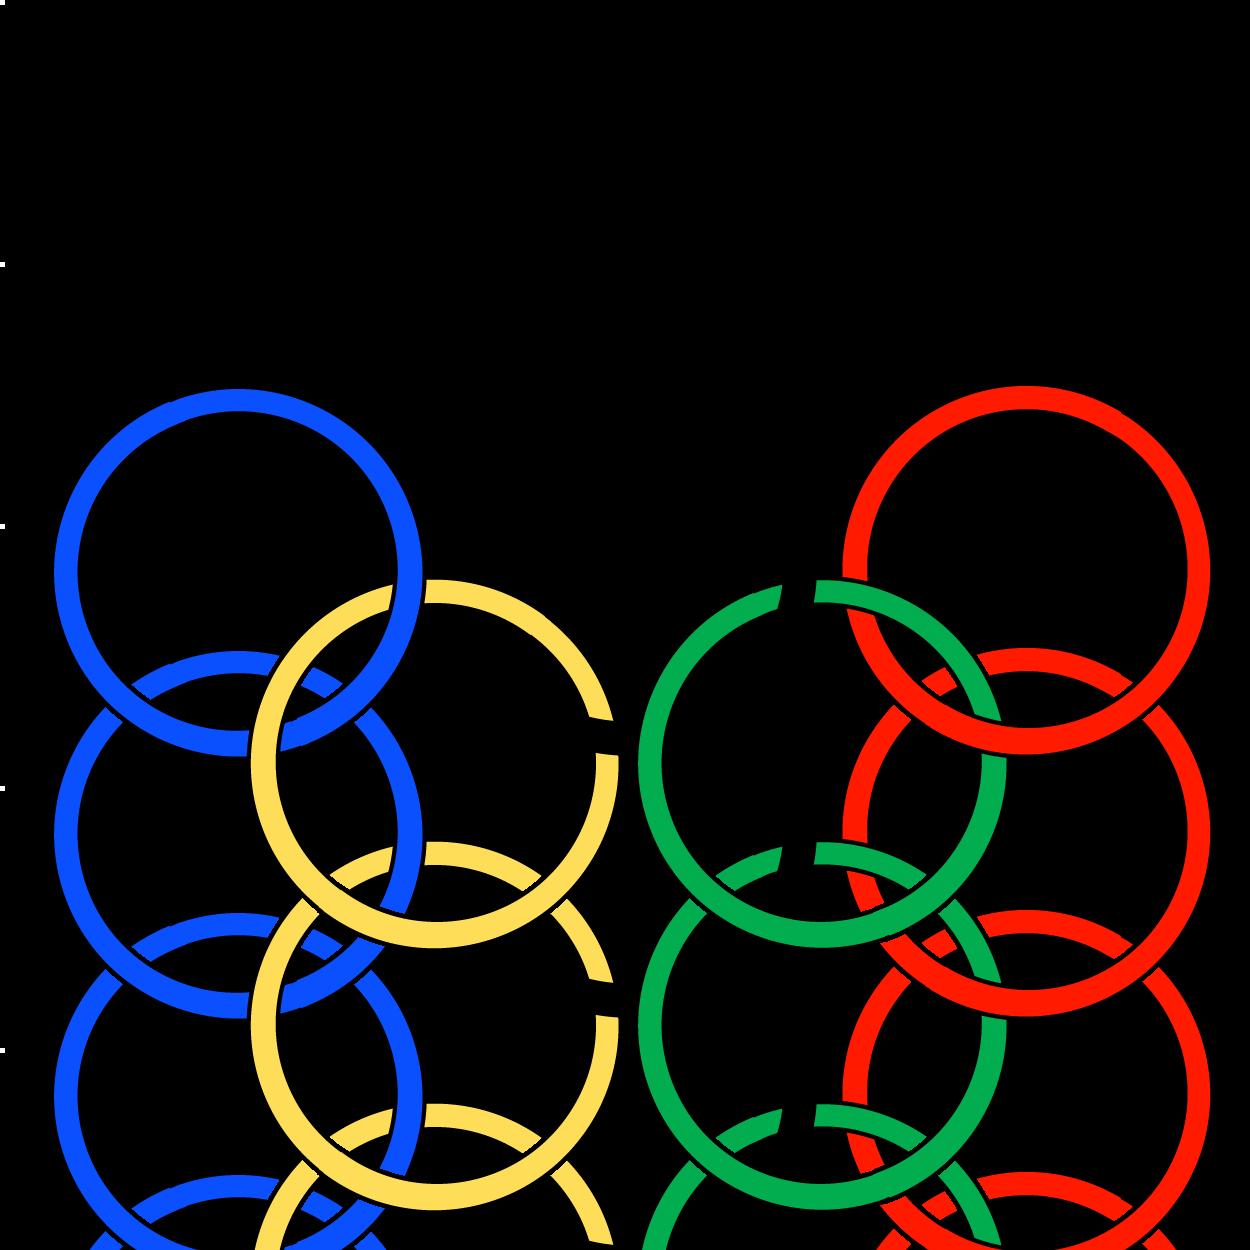 Clip art free panda. Podium clipart podium olympic